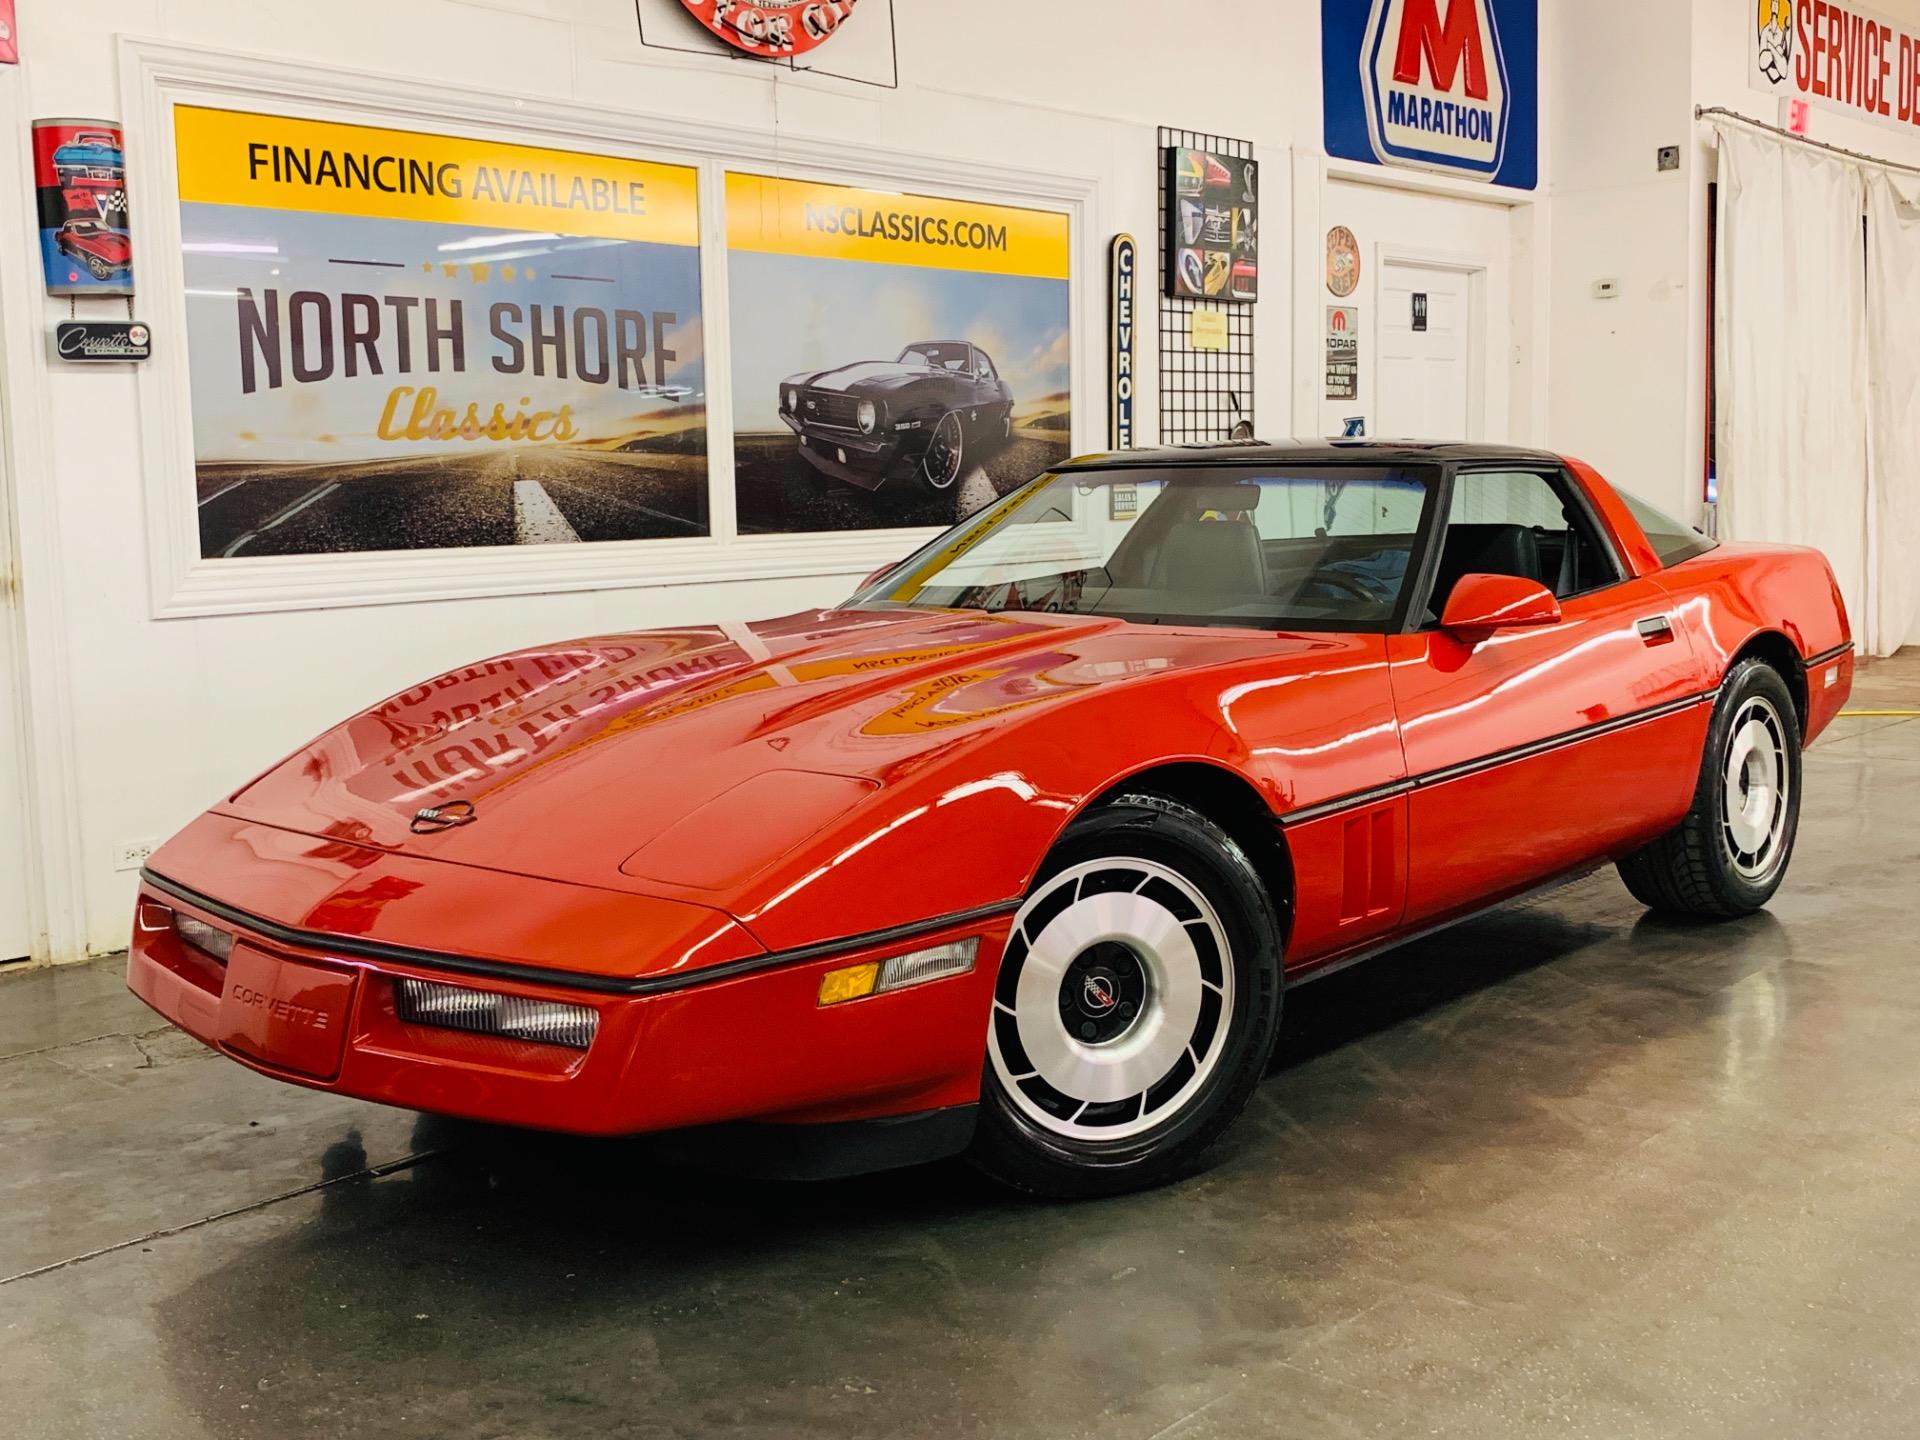 Used 1985 Chevrolet Corvette -VERY LOW ORIGINAL MILES - SUPER CLEAN - | Mundelein, IL